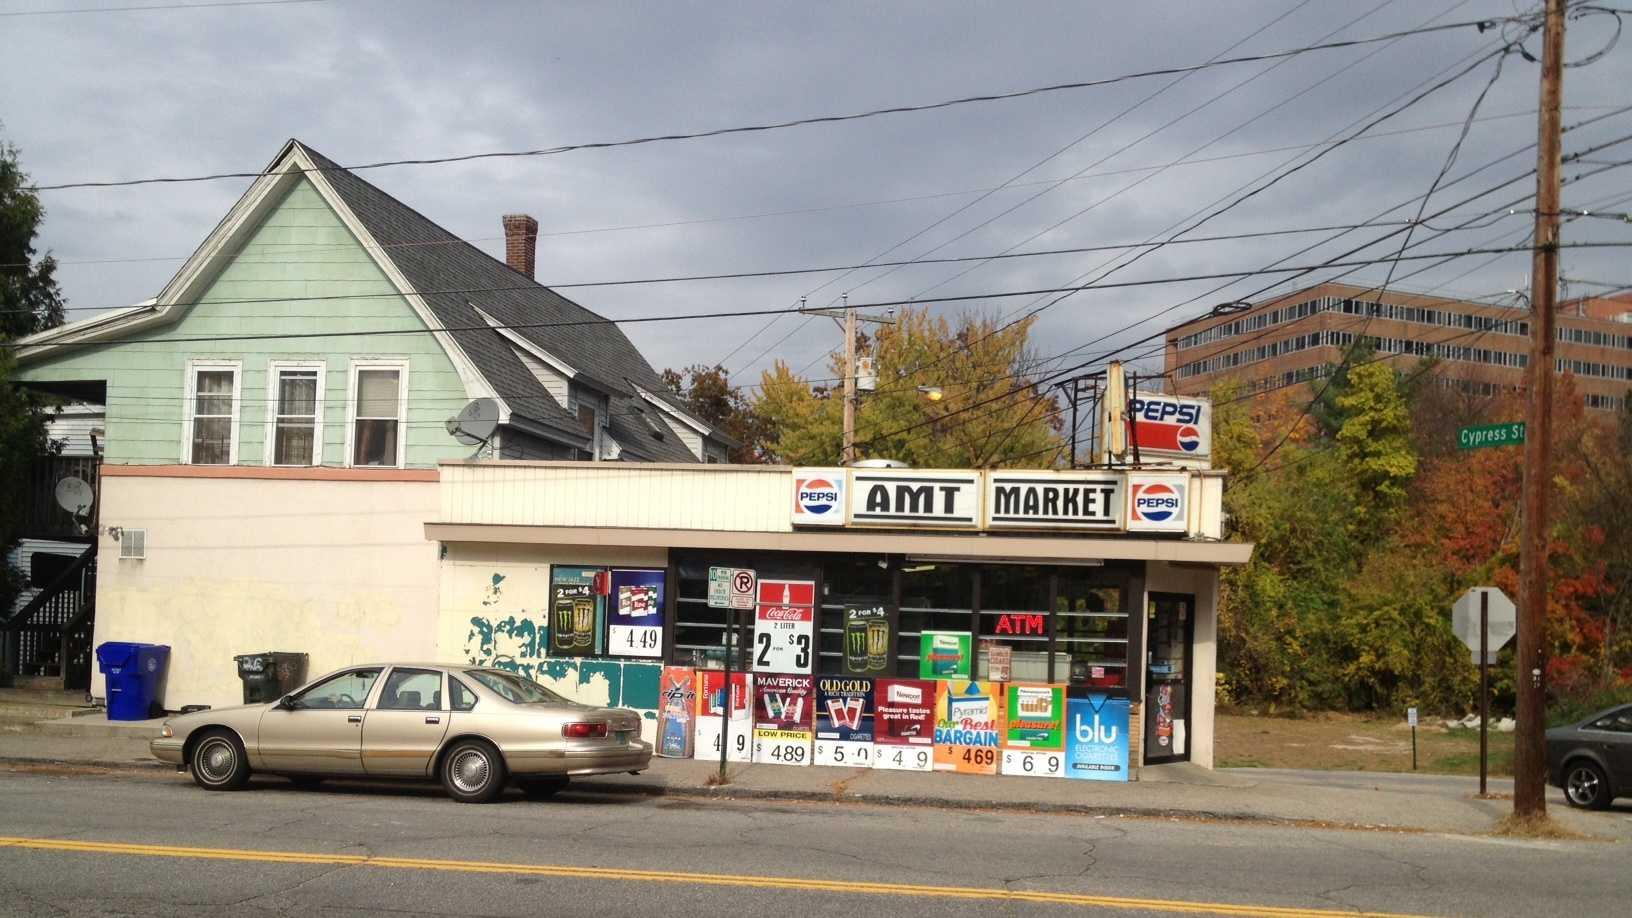 AMT Market